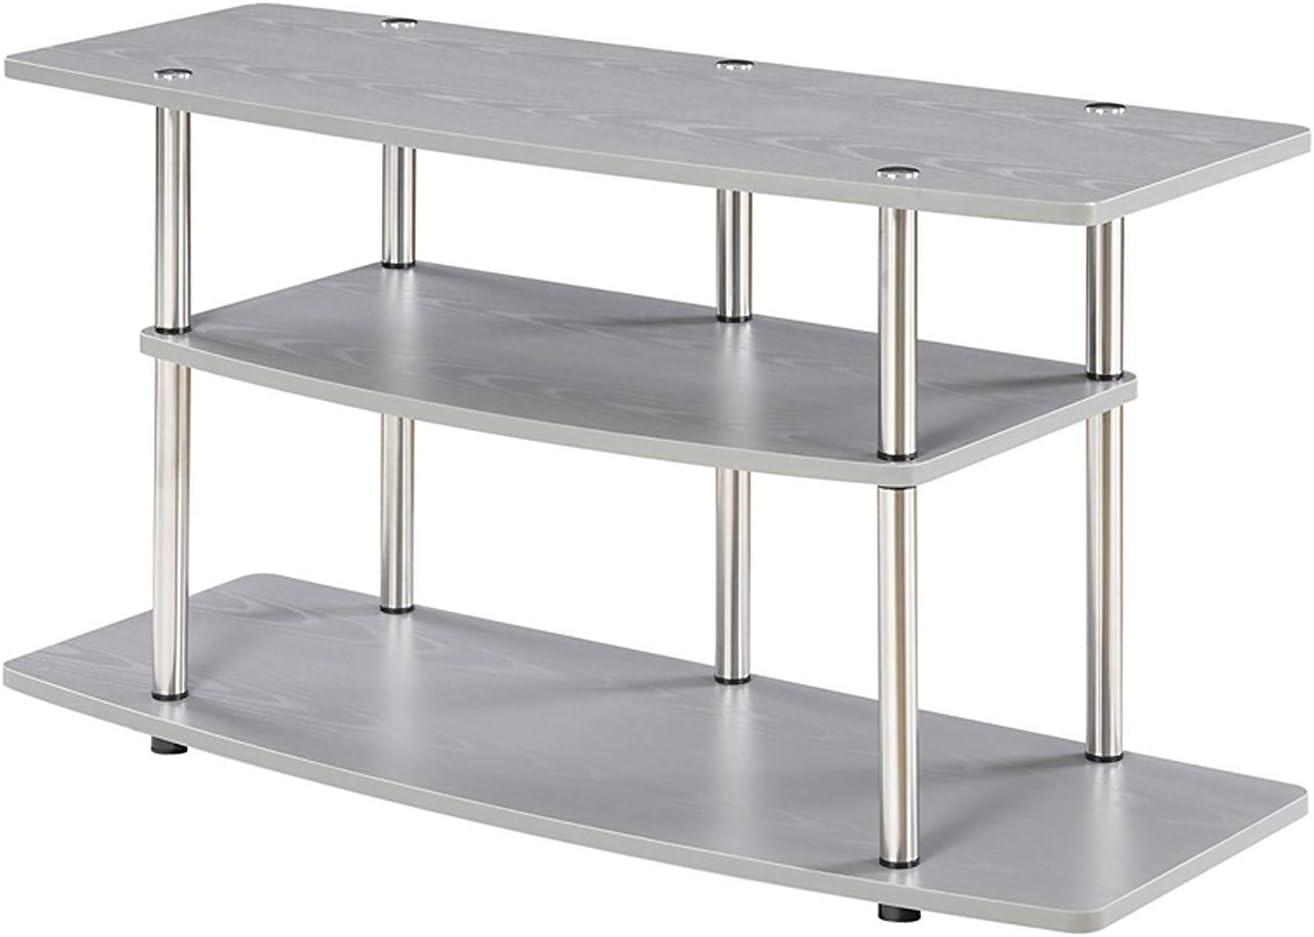 Convenience Concepts Designs2Go 3-Tier Wide TV Stand, Gray